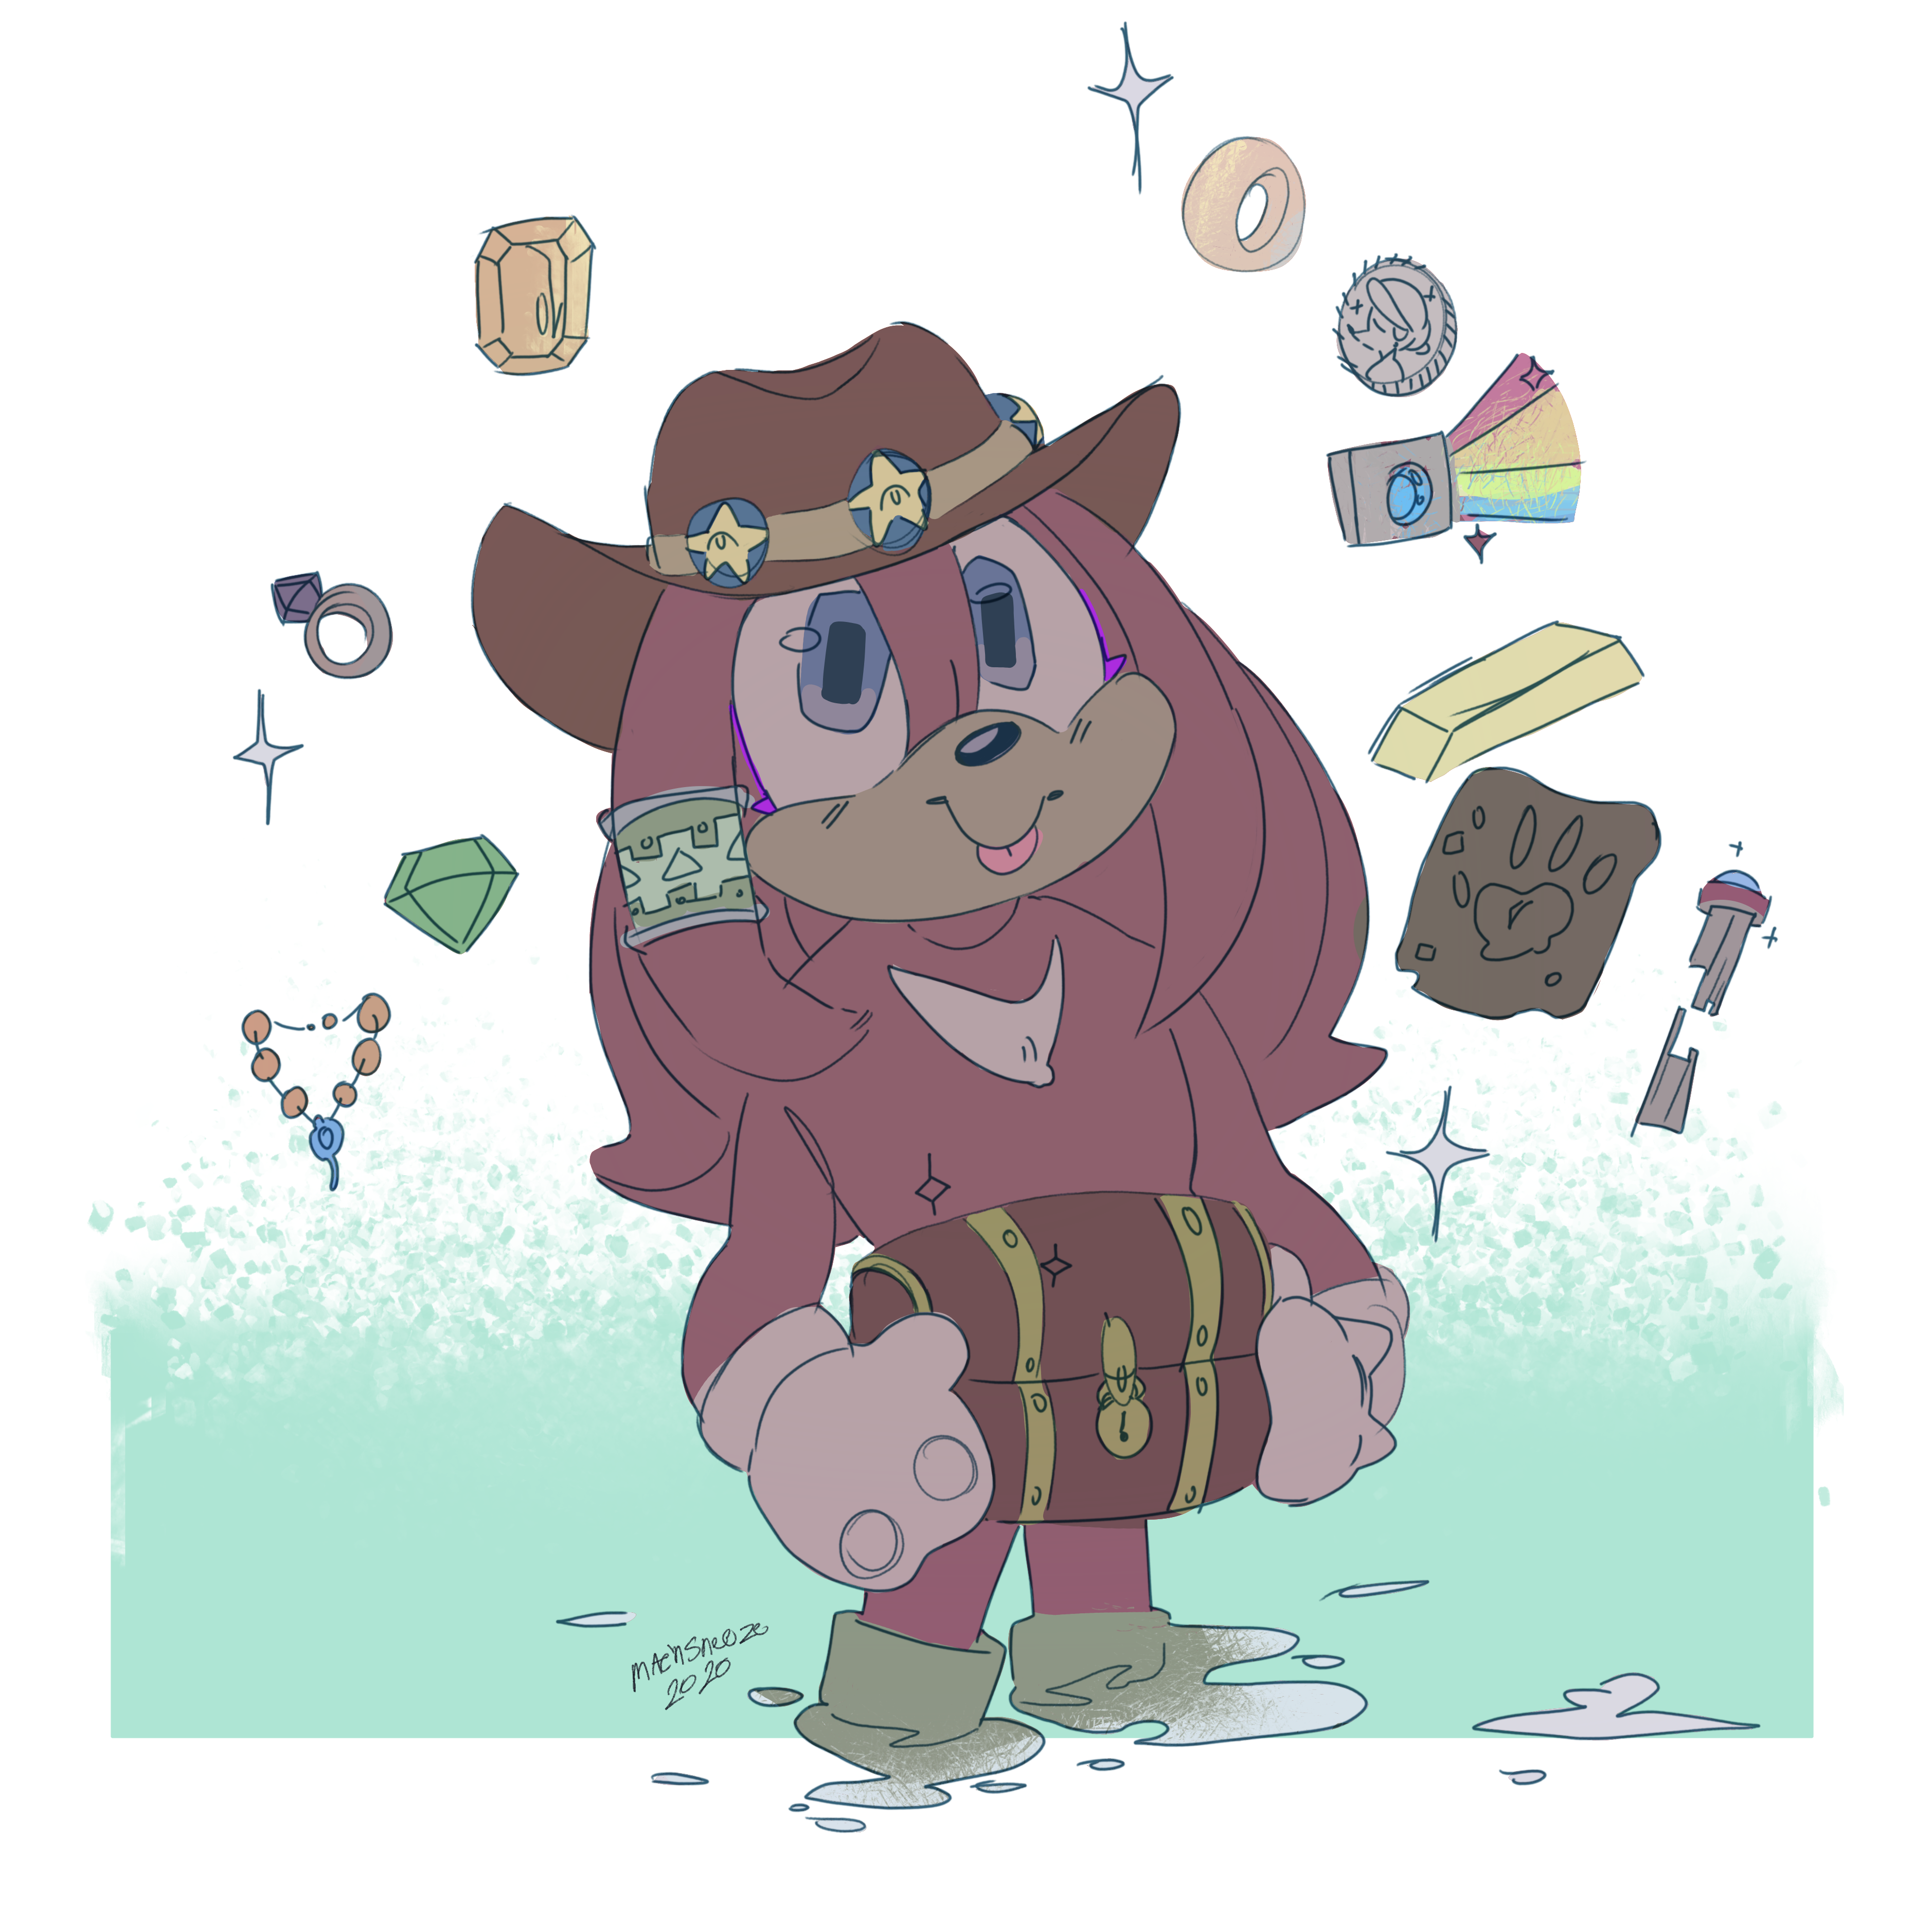 The treasure boi!